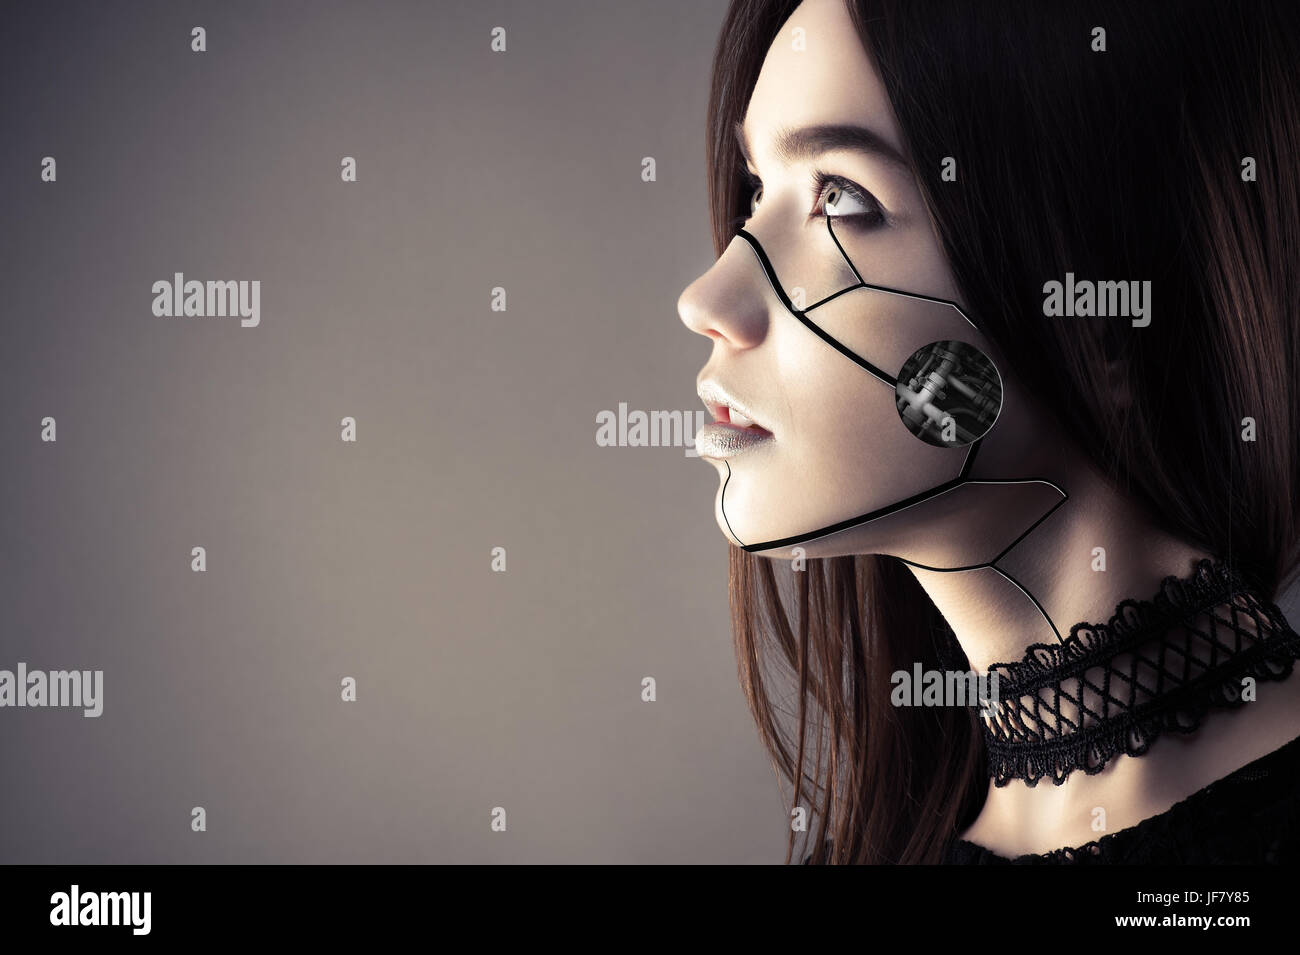 Hermosa chica con maquillaje moda cyberpunk mirando hacia arriba Imagen De Stock